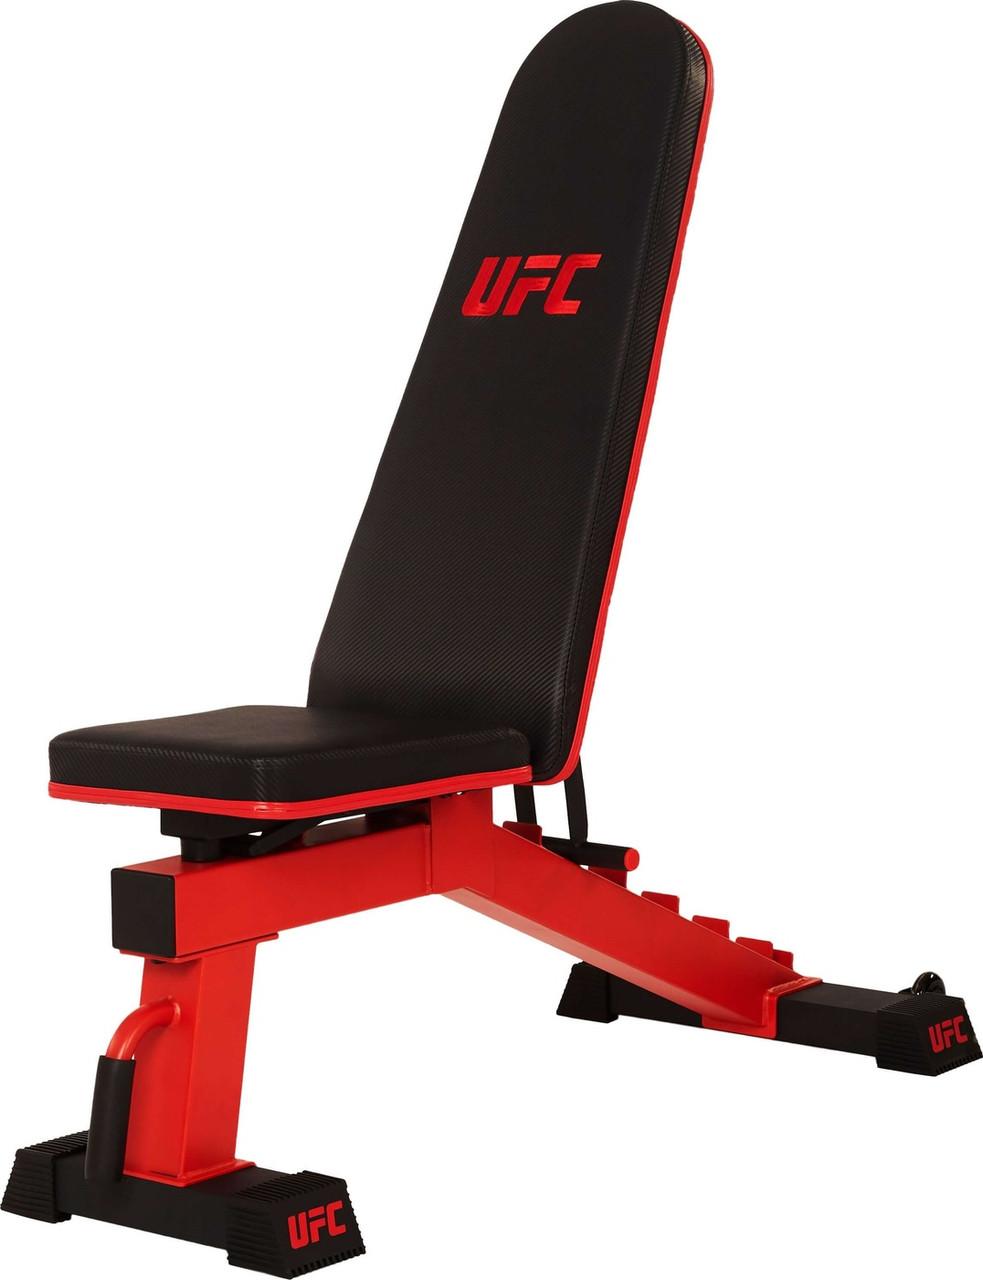 Скамья универсальная Deluxe UFC DFID